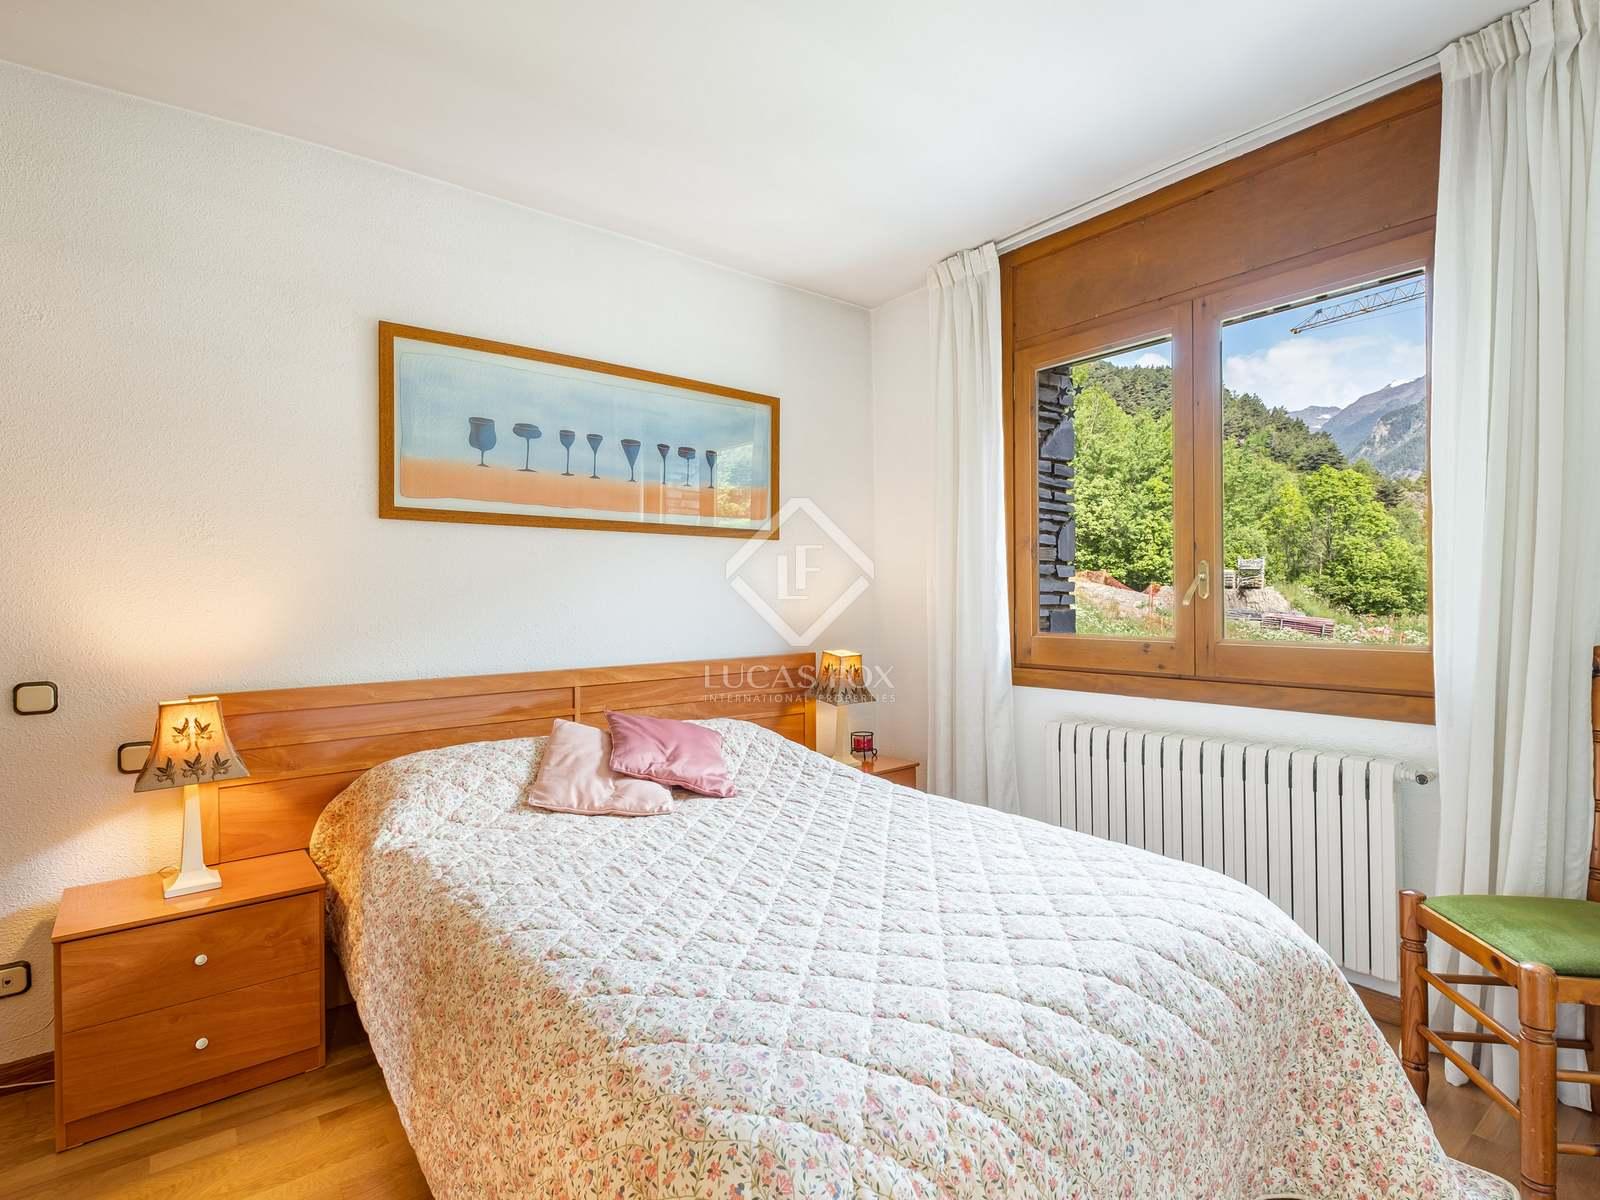 Dormitorio : Imagen de la vivienda